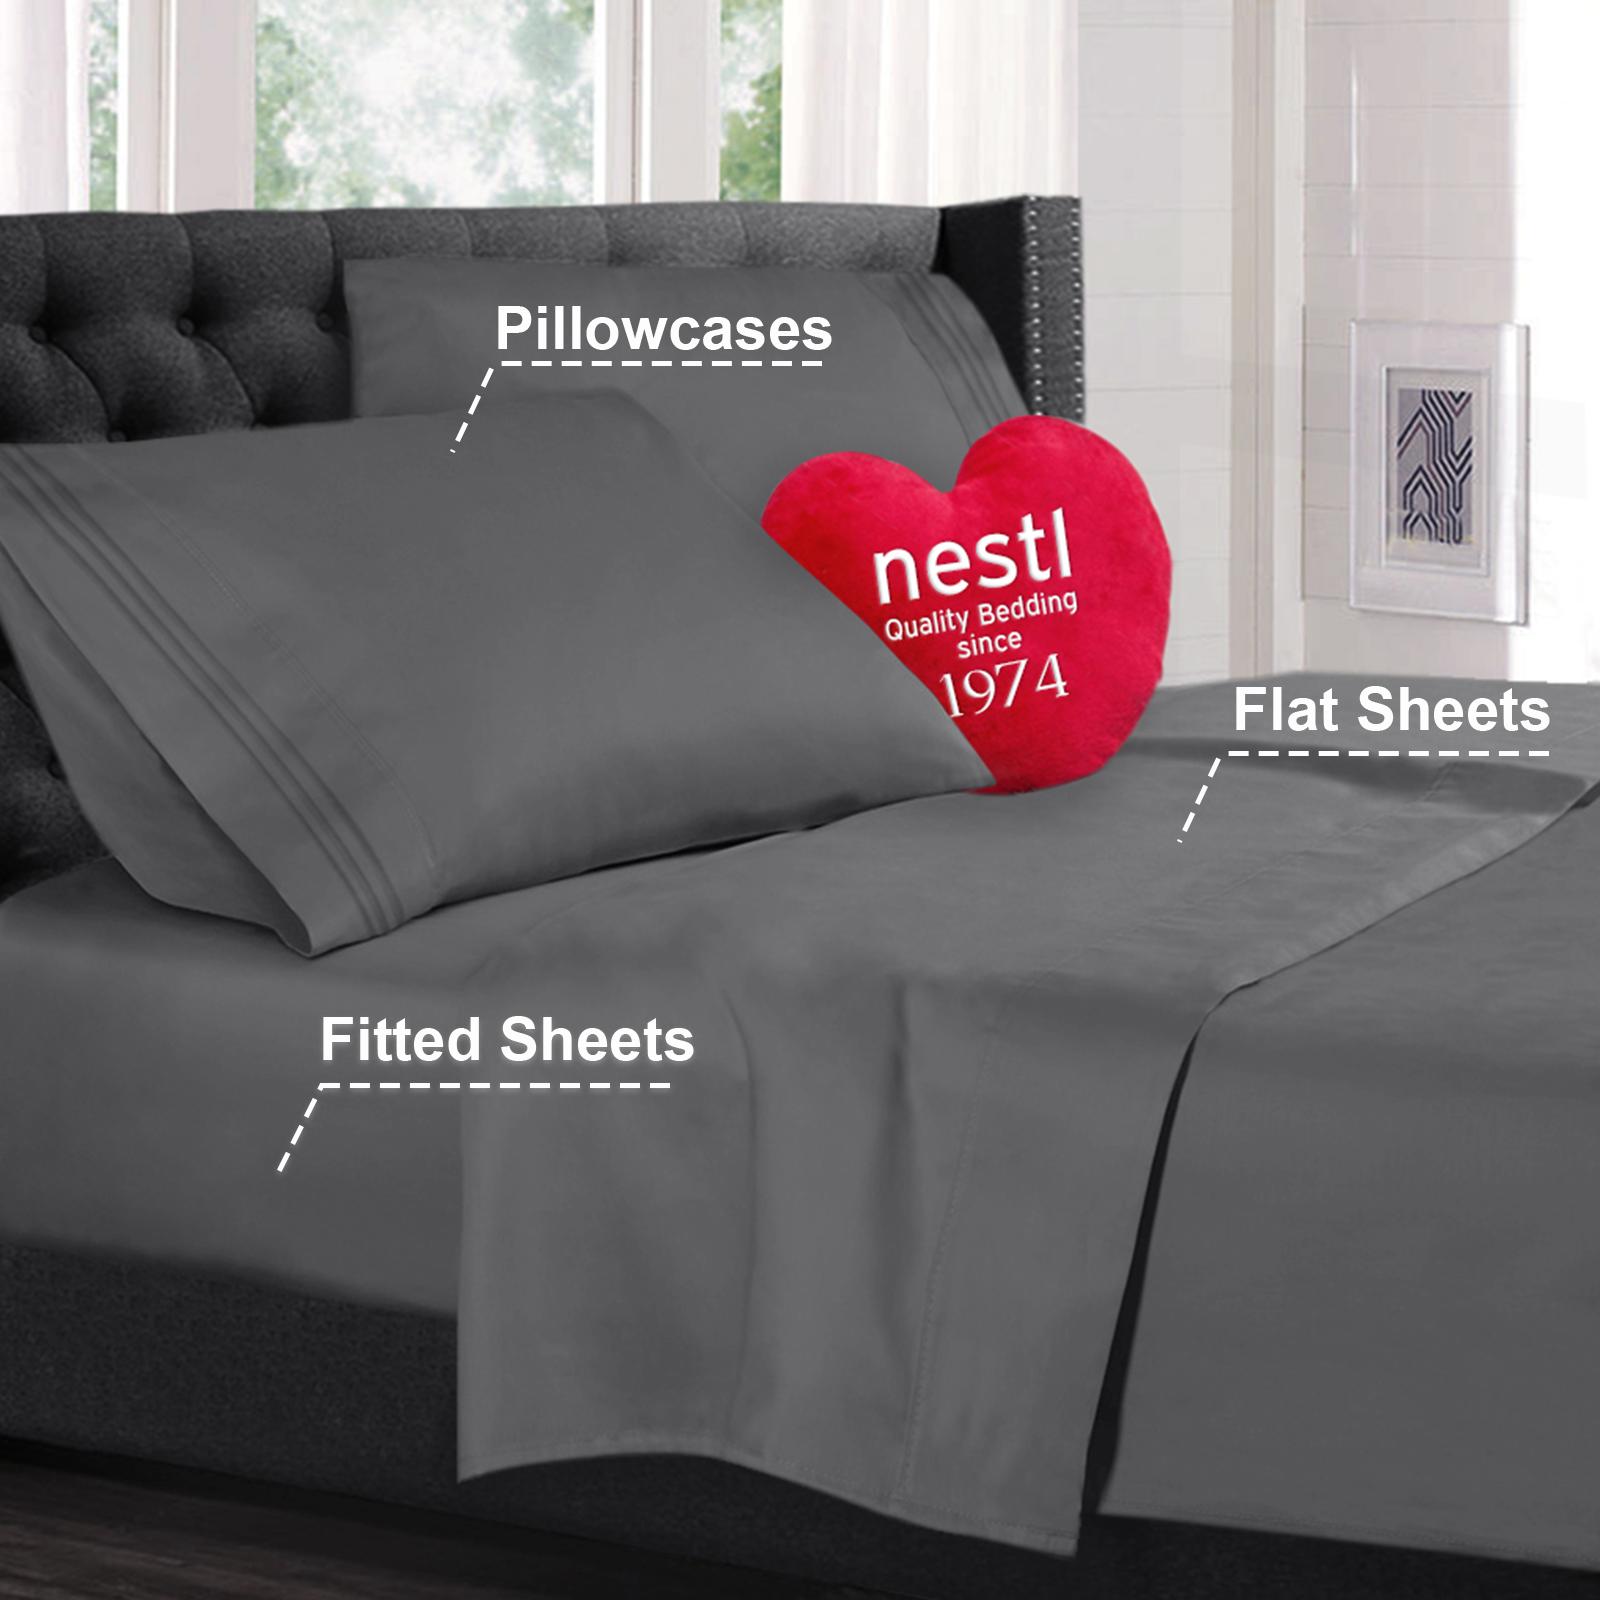 Details About Double Brushed Soft Microfiber Hotel Style Bed Sheets Deep Pocket Sheet Set